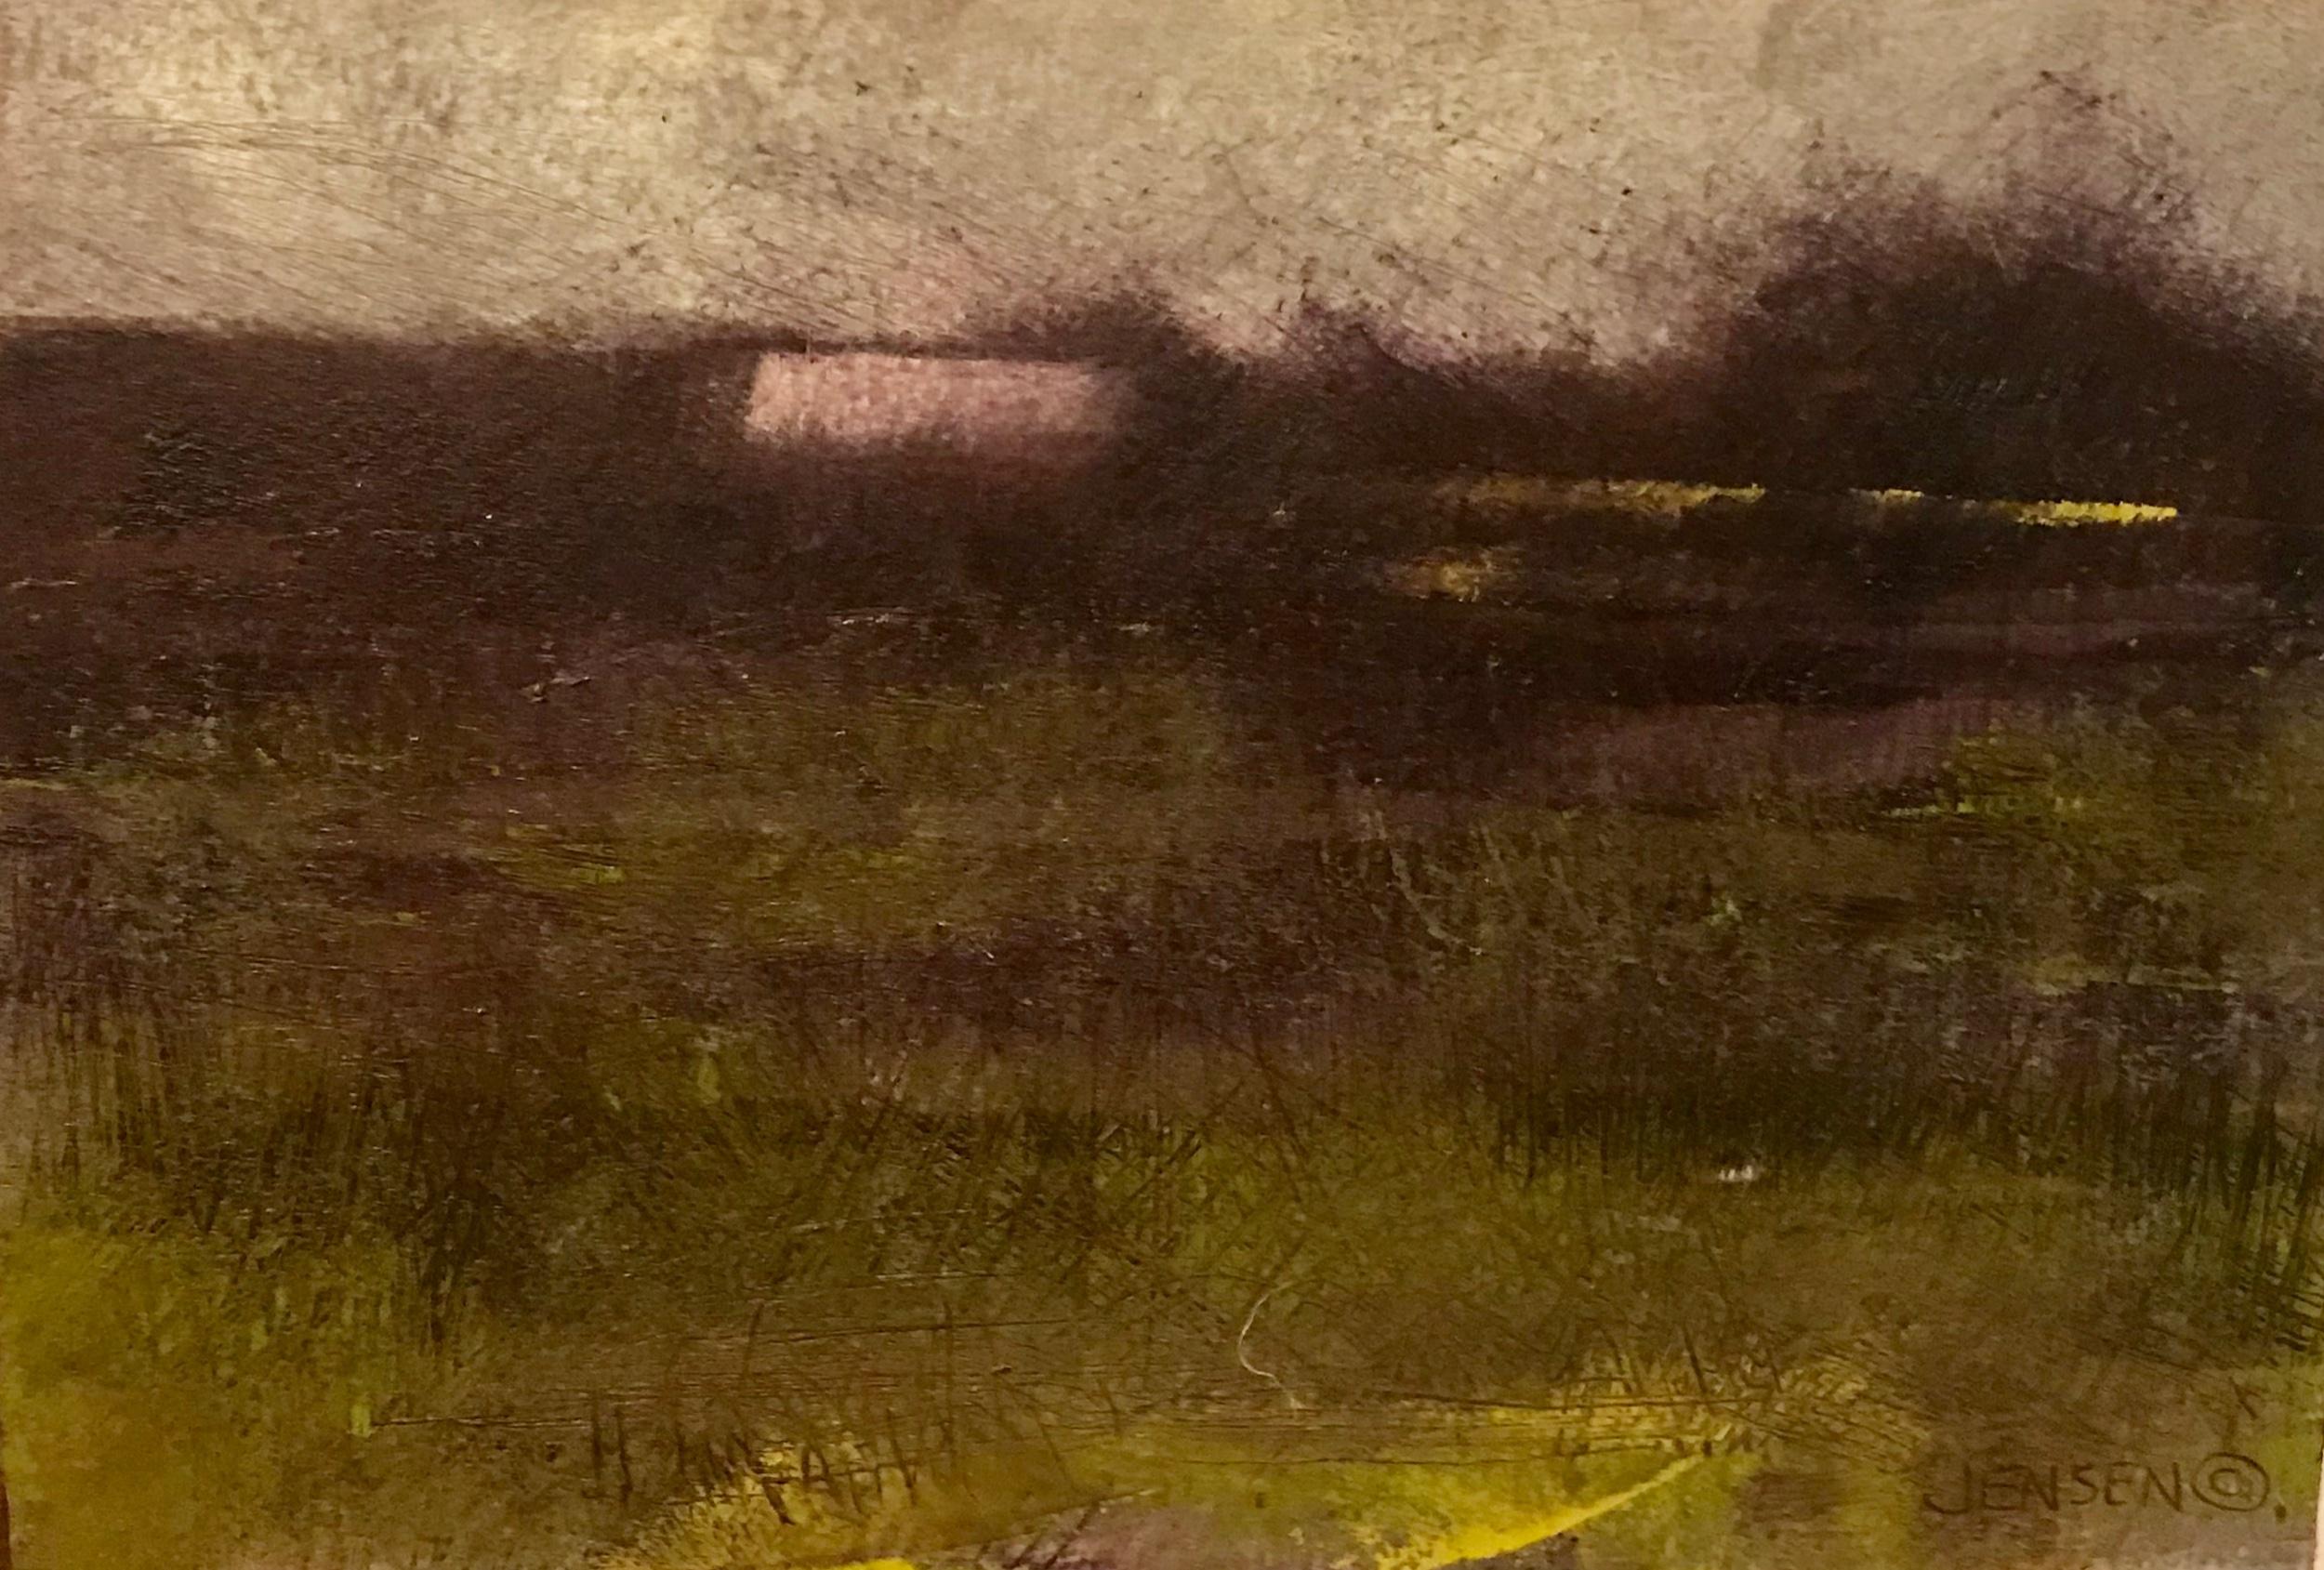 Farm Landscape #20 framed 13.25x15.75 $580